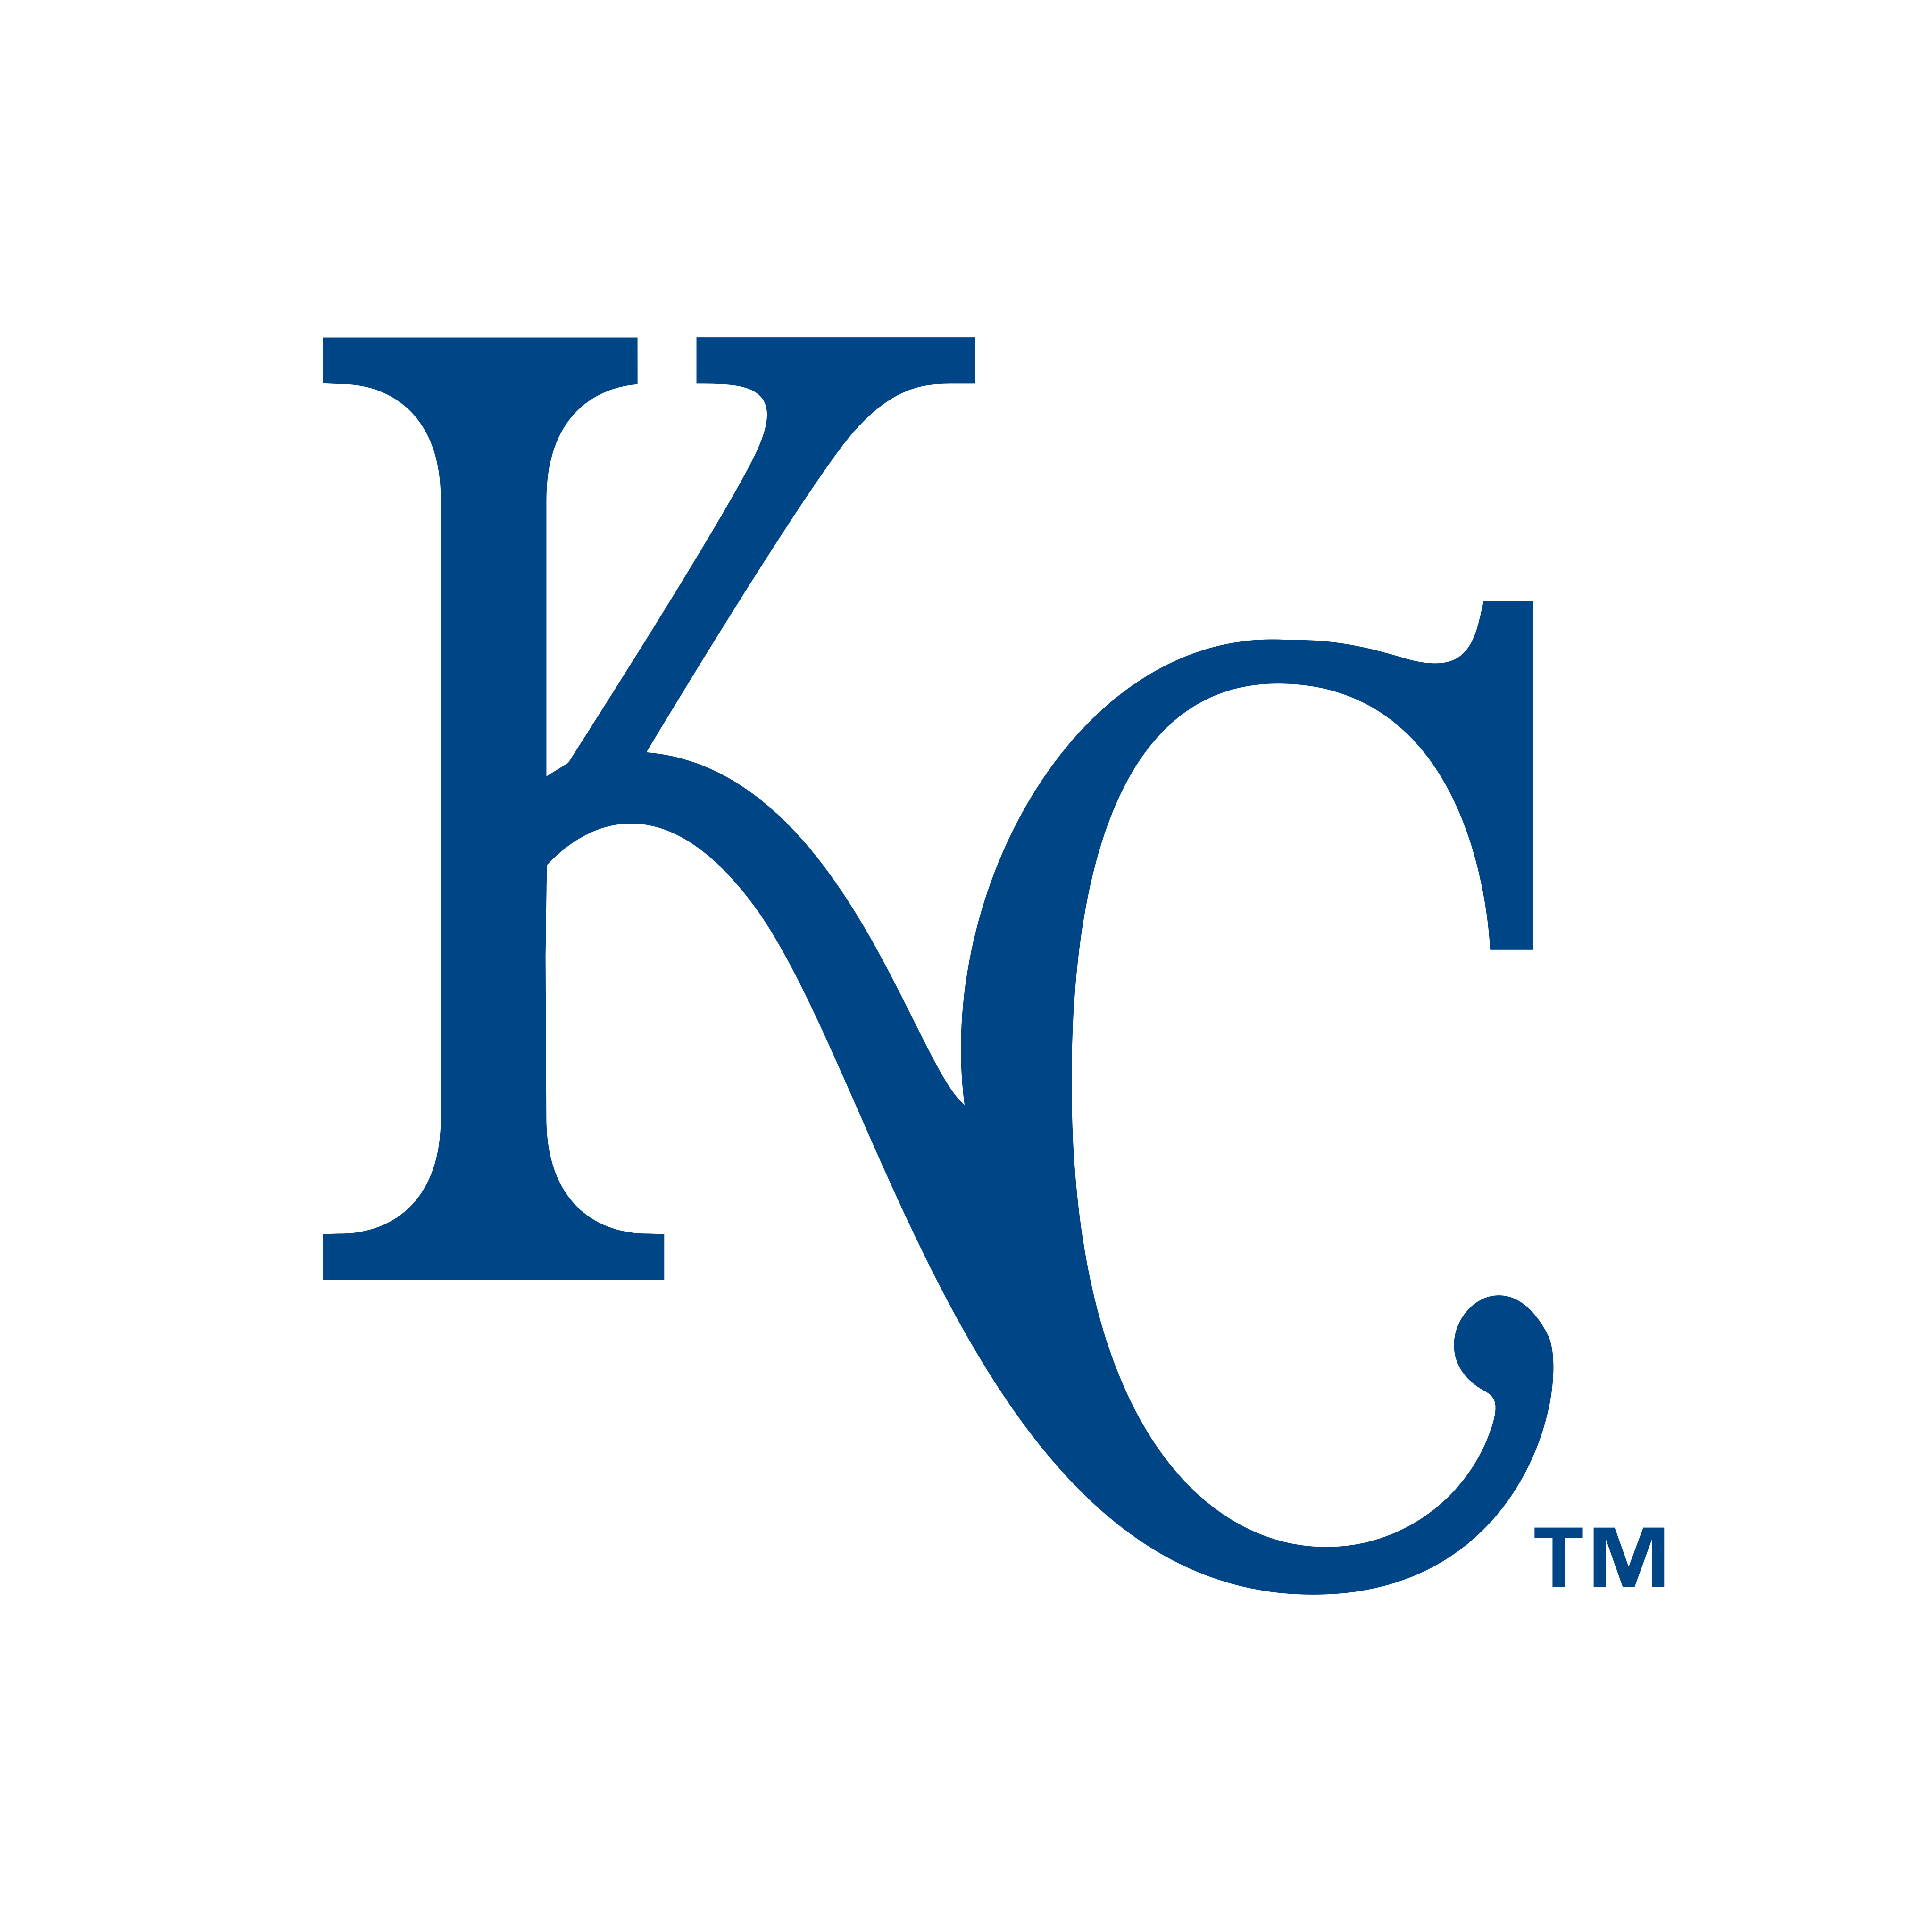 kansas city royals logo 0 - Kansas City Royals Logo